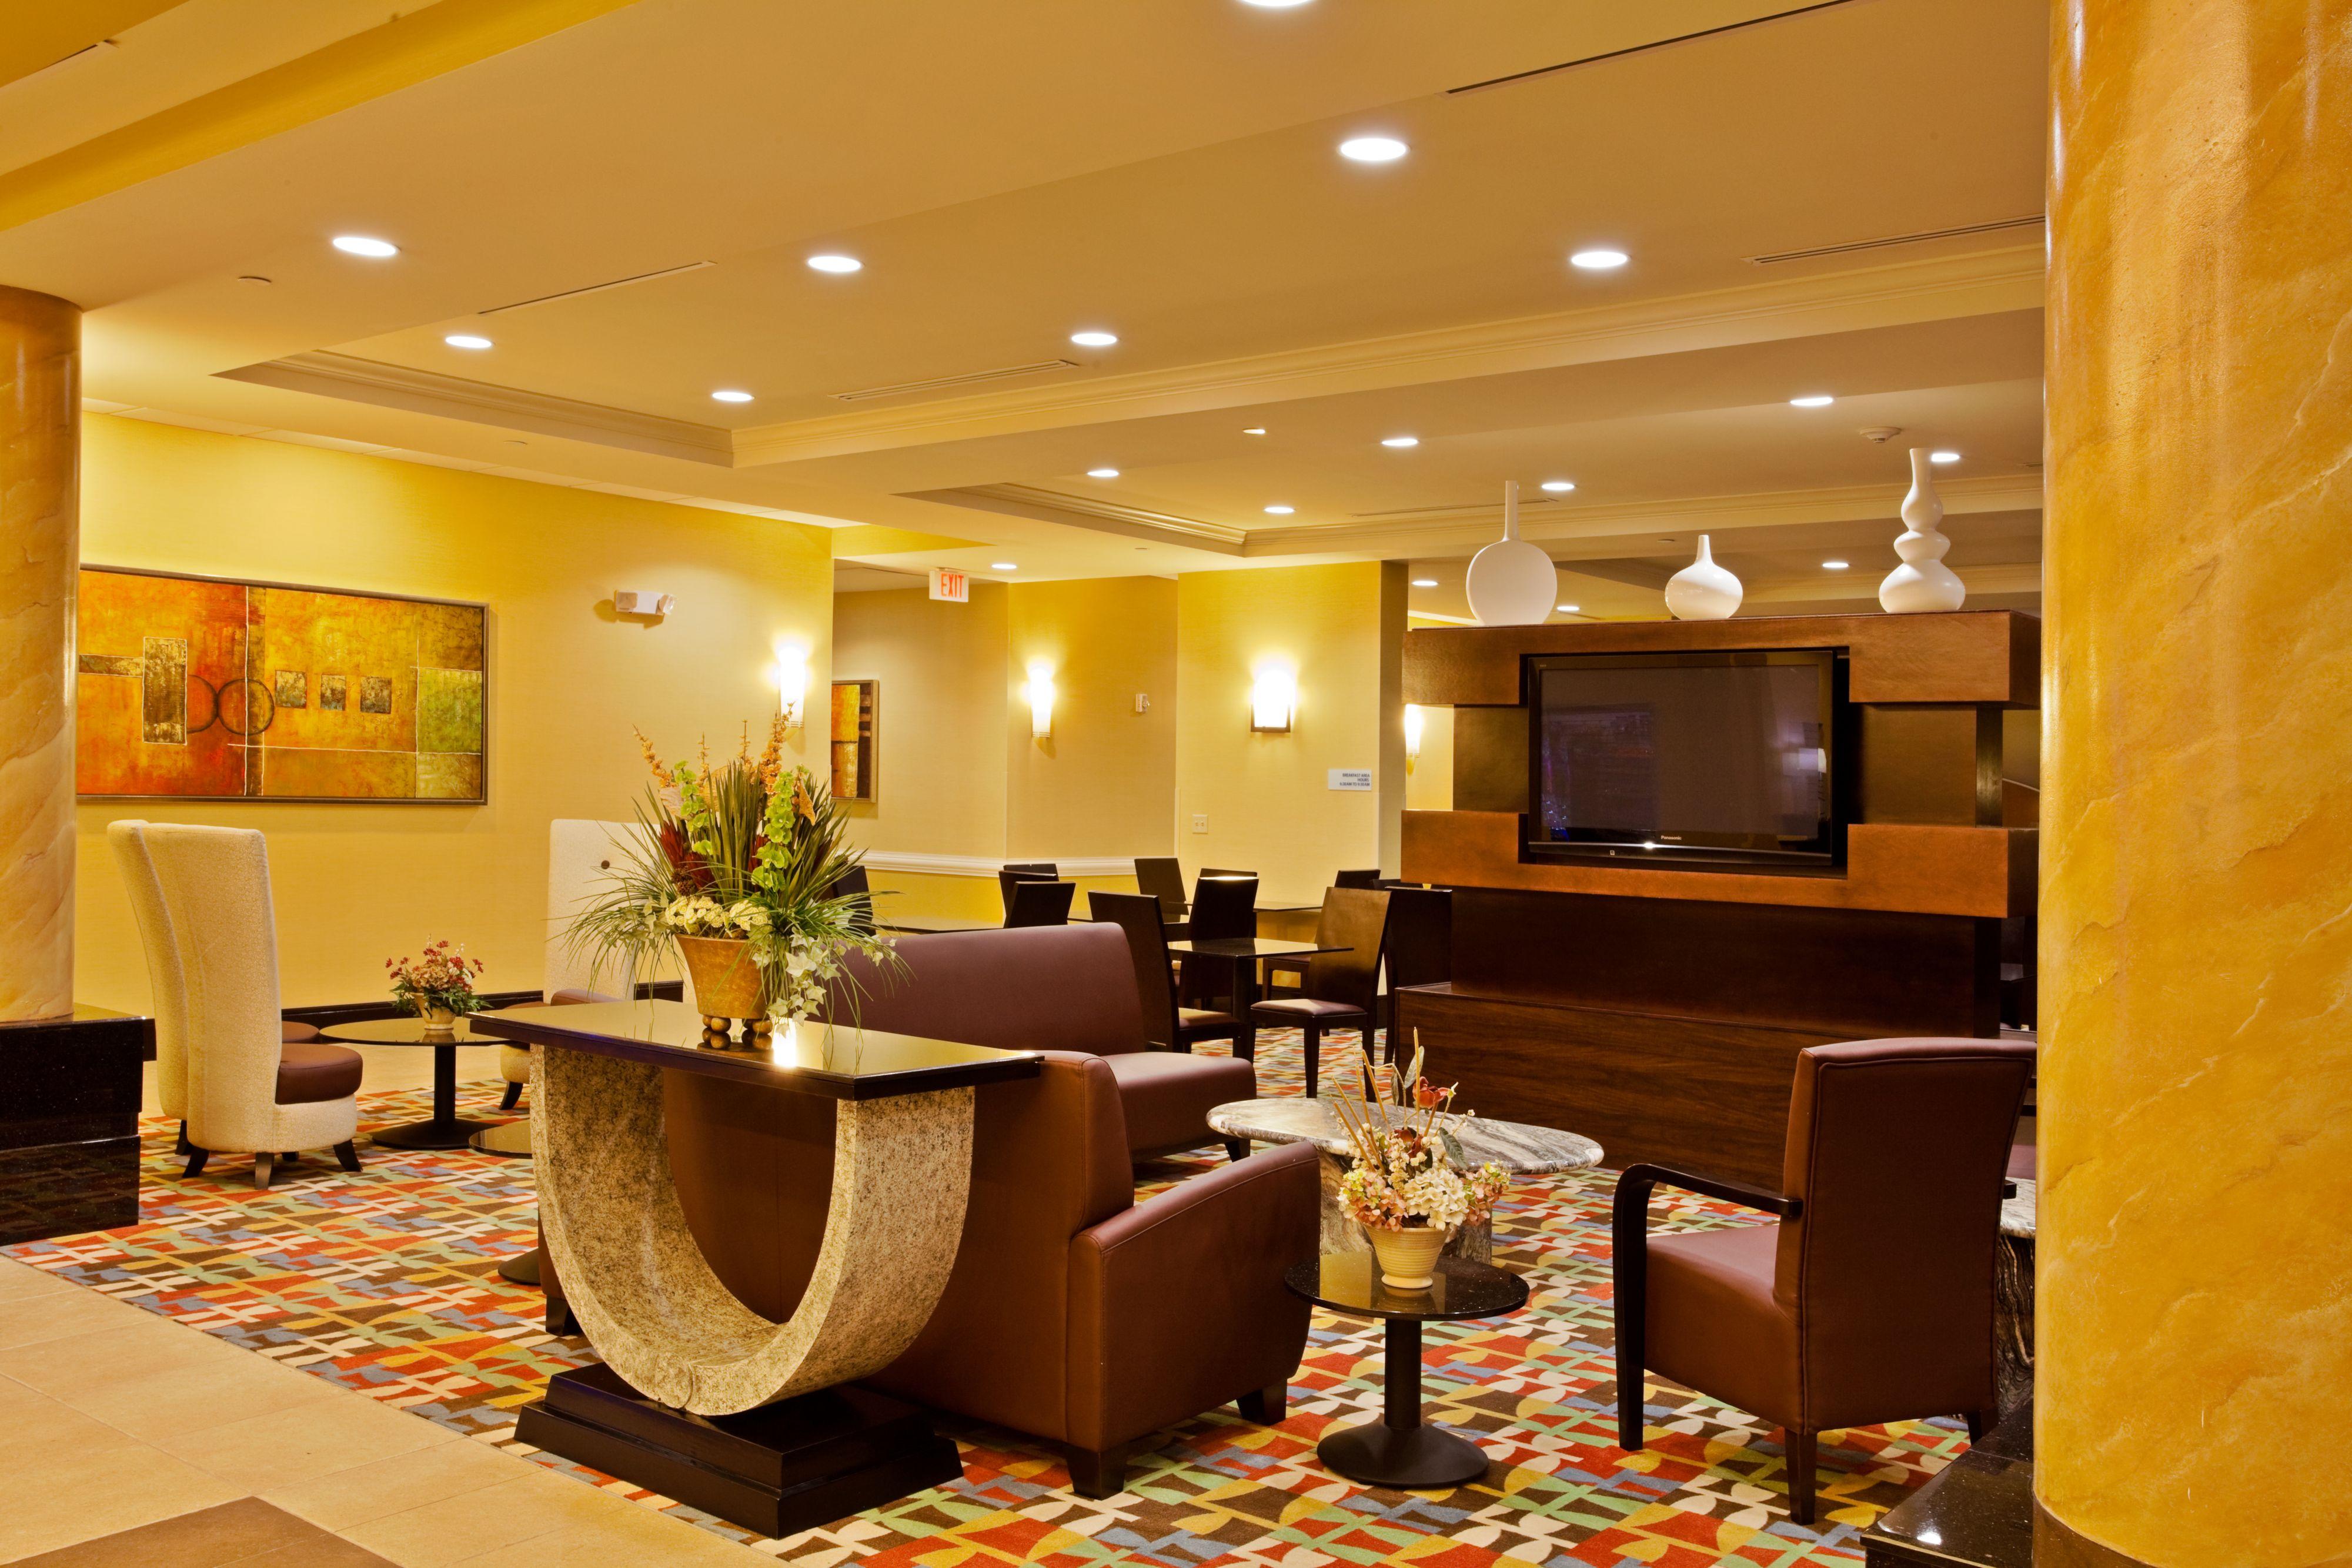 Holiday Inn Express & Suites Orlando - International Drive image 4